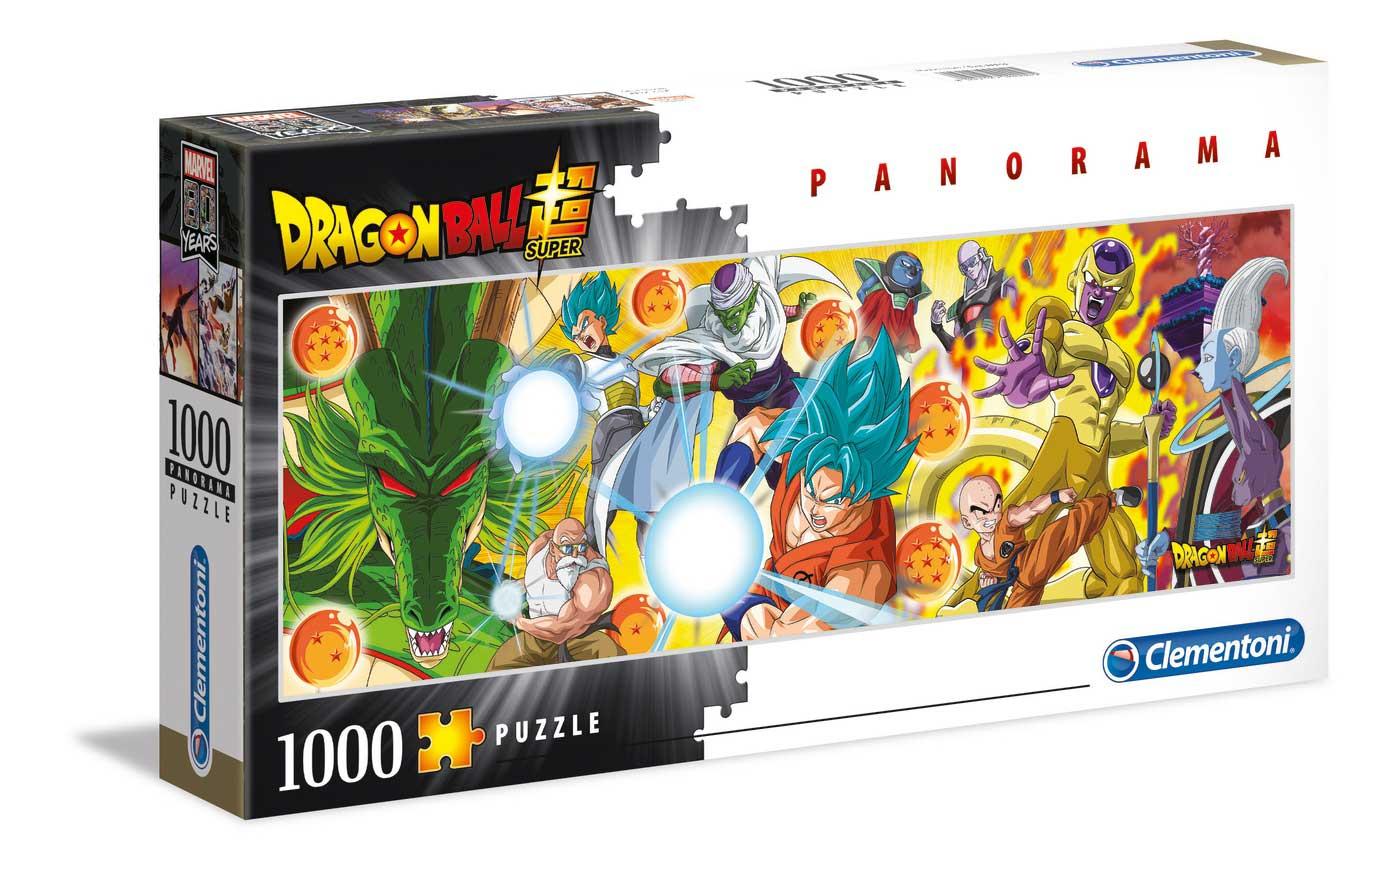 Puzzle Clementoni Dragon Ball Panorámico de 1000 Piezas